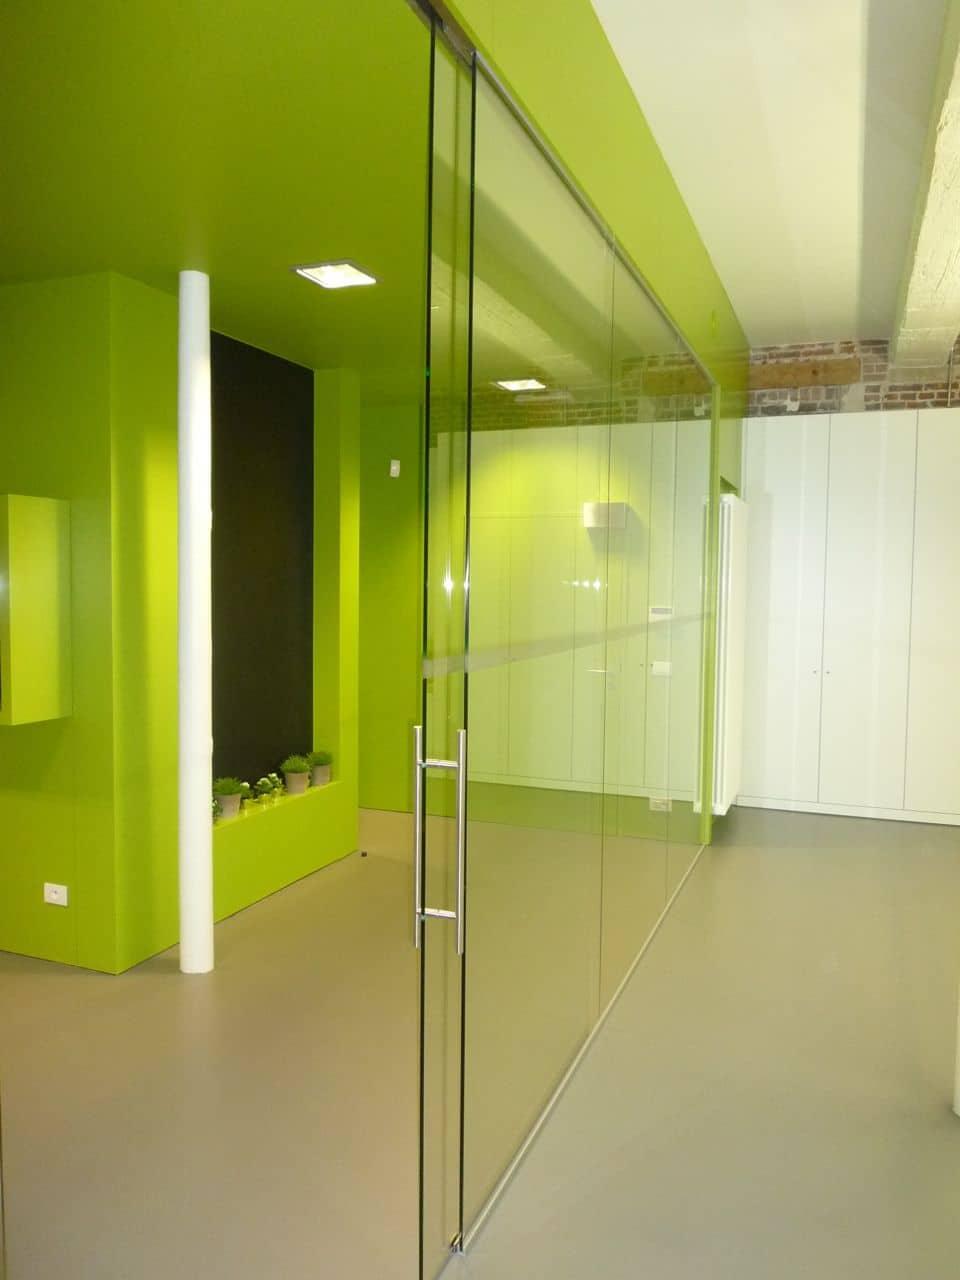 P1060751 | Baeyens & Beck architecten Gent | architect nieuwbouw renovatie interieur | high end | architectenbureau